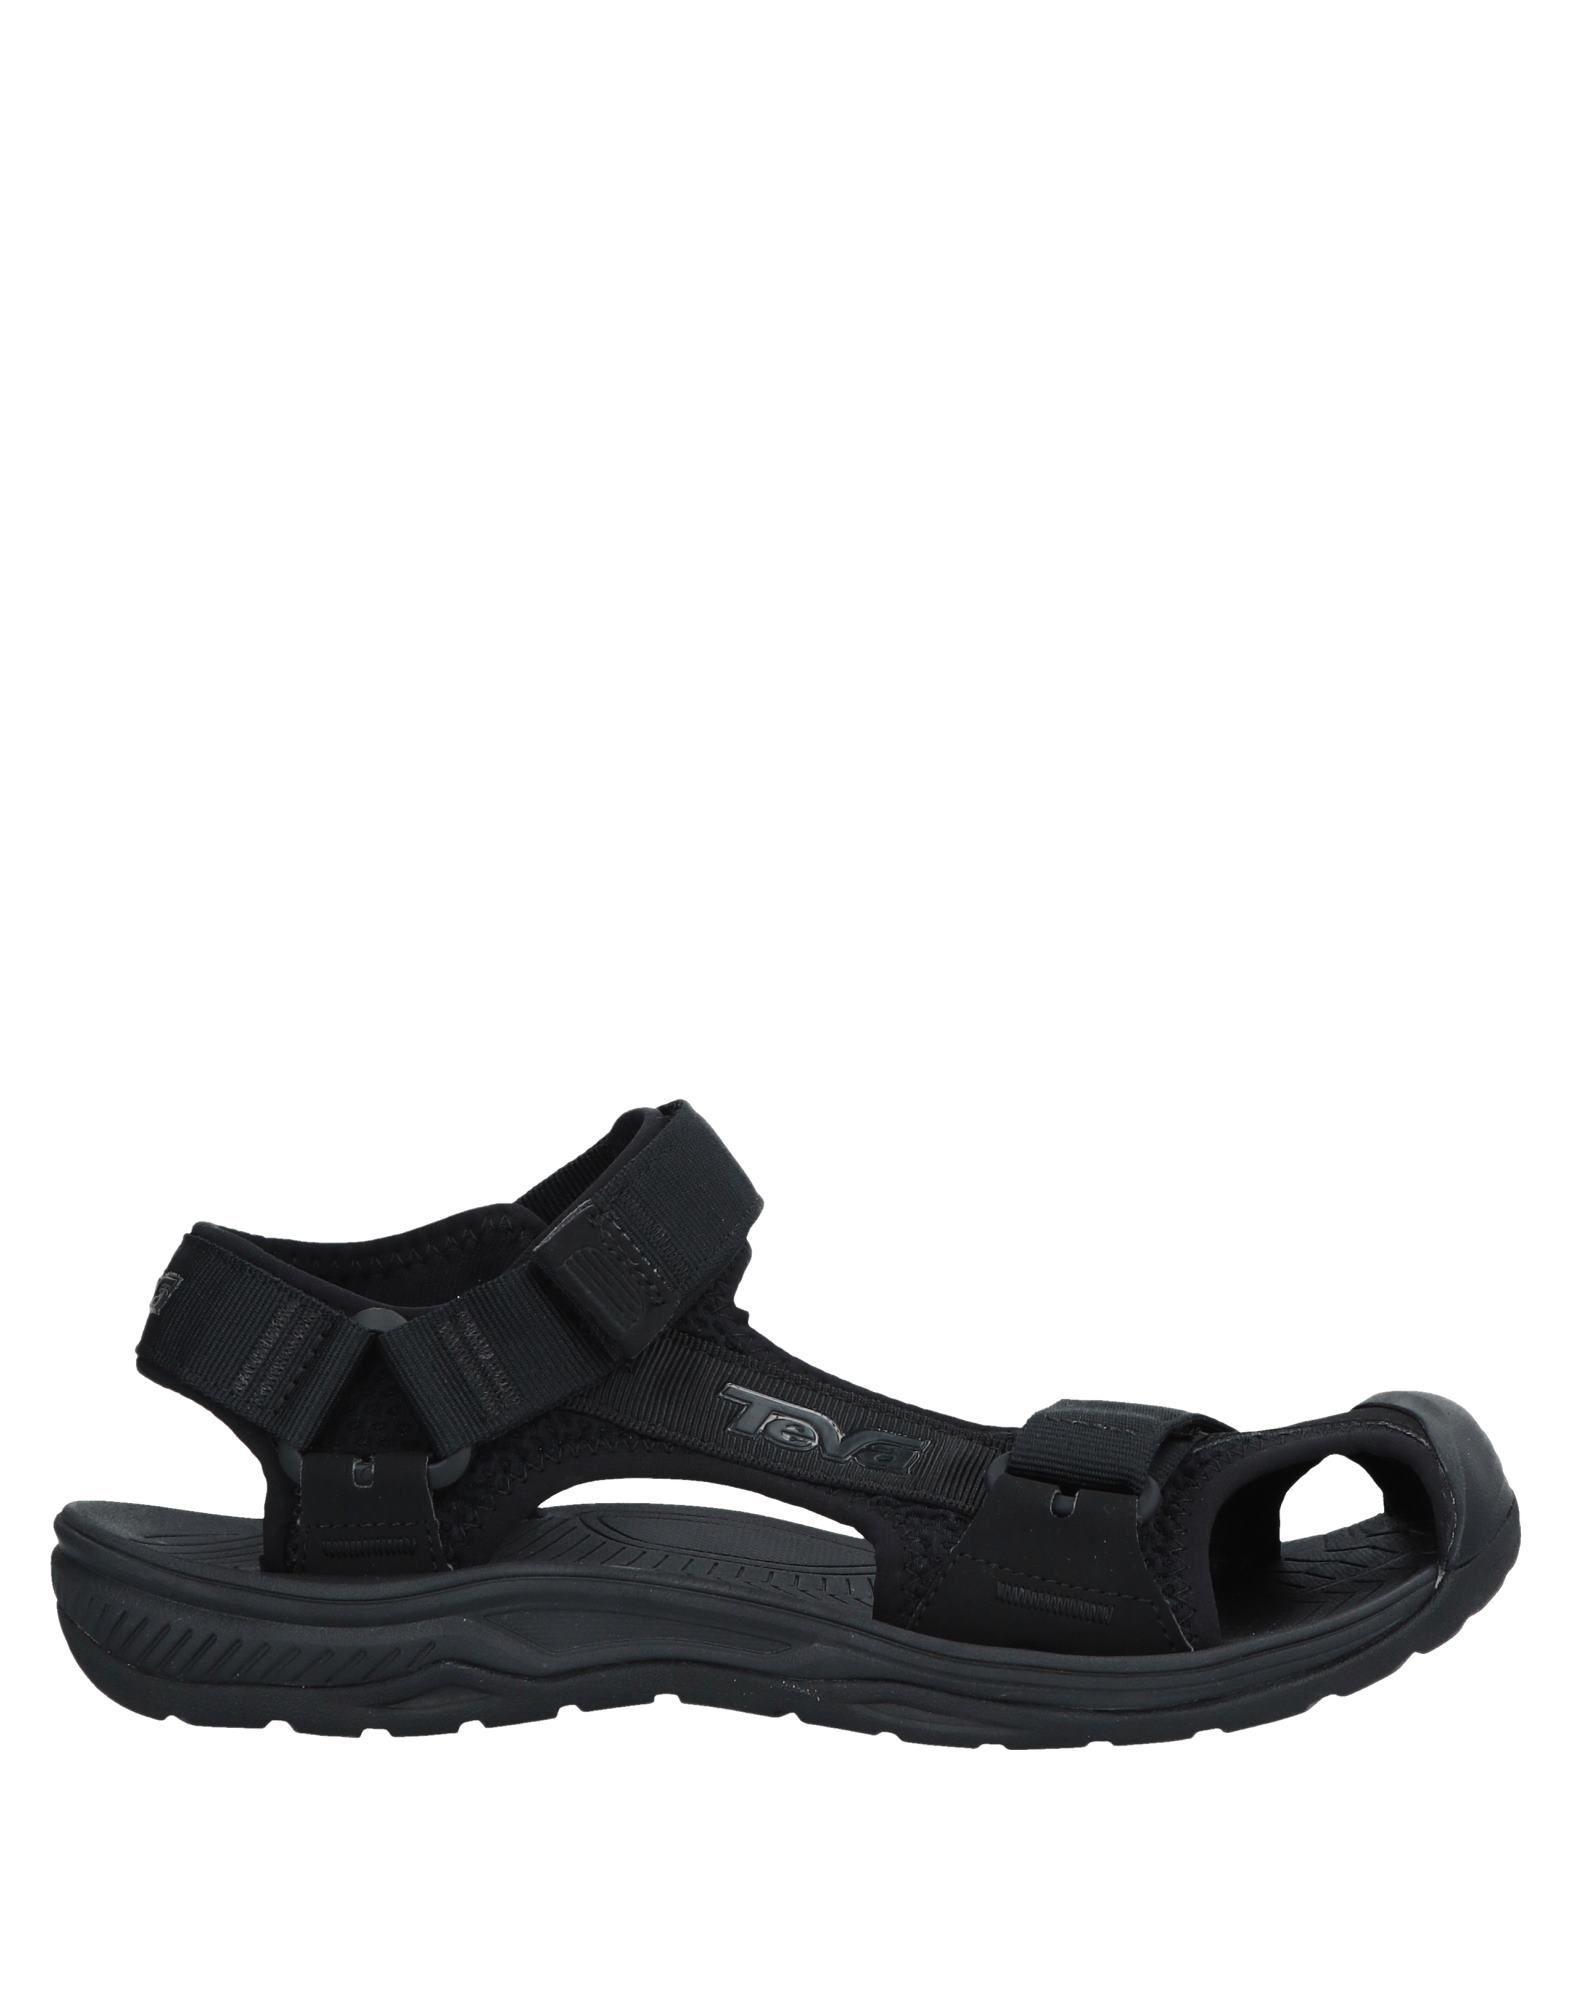 3781cc731ea4 Lyst - Teva Sandals in Black for Men